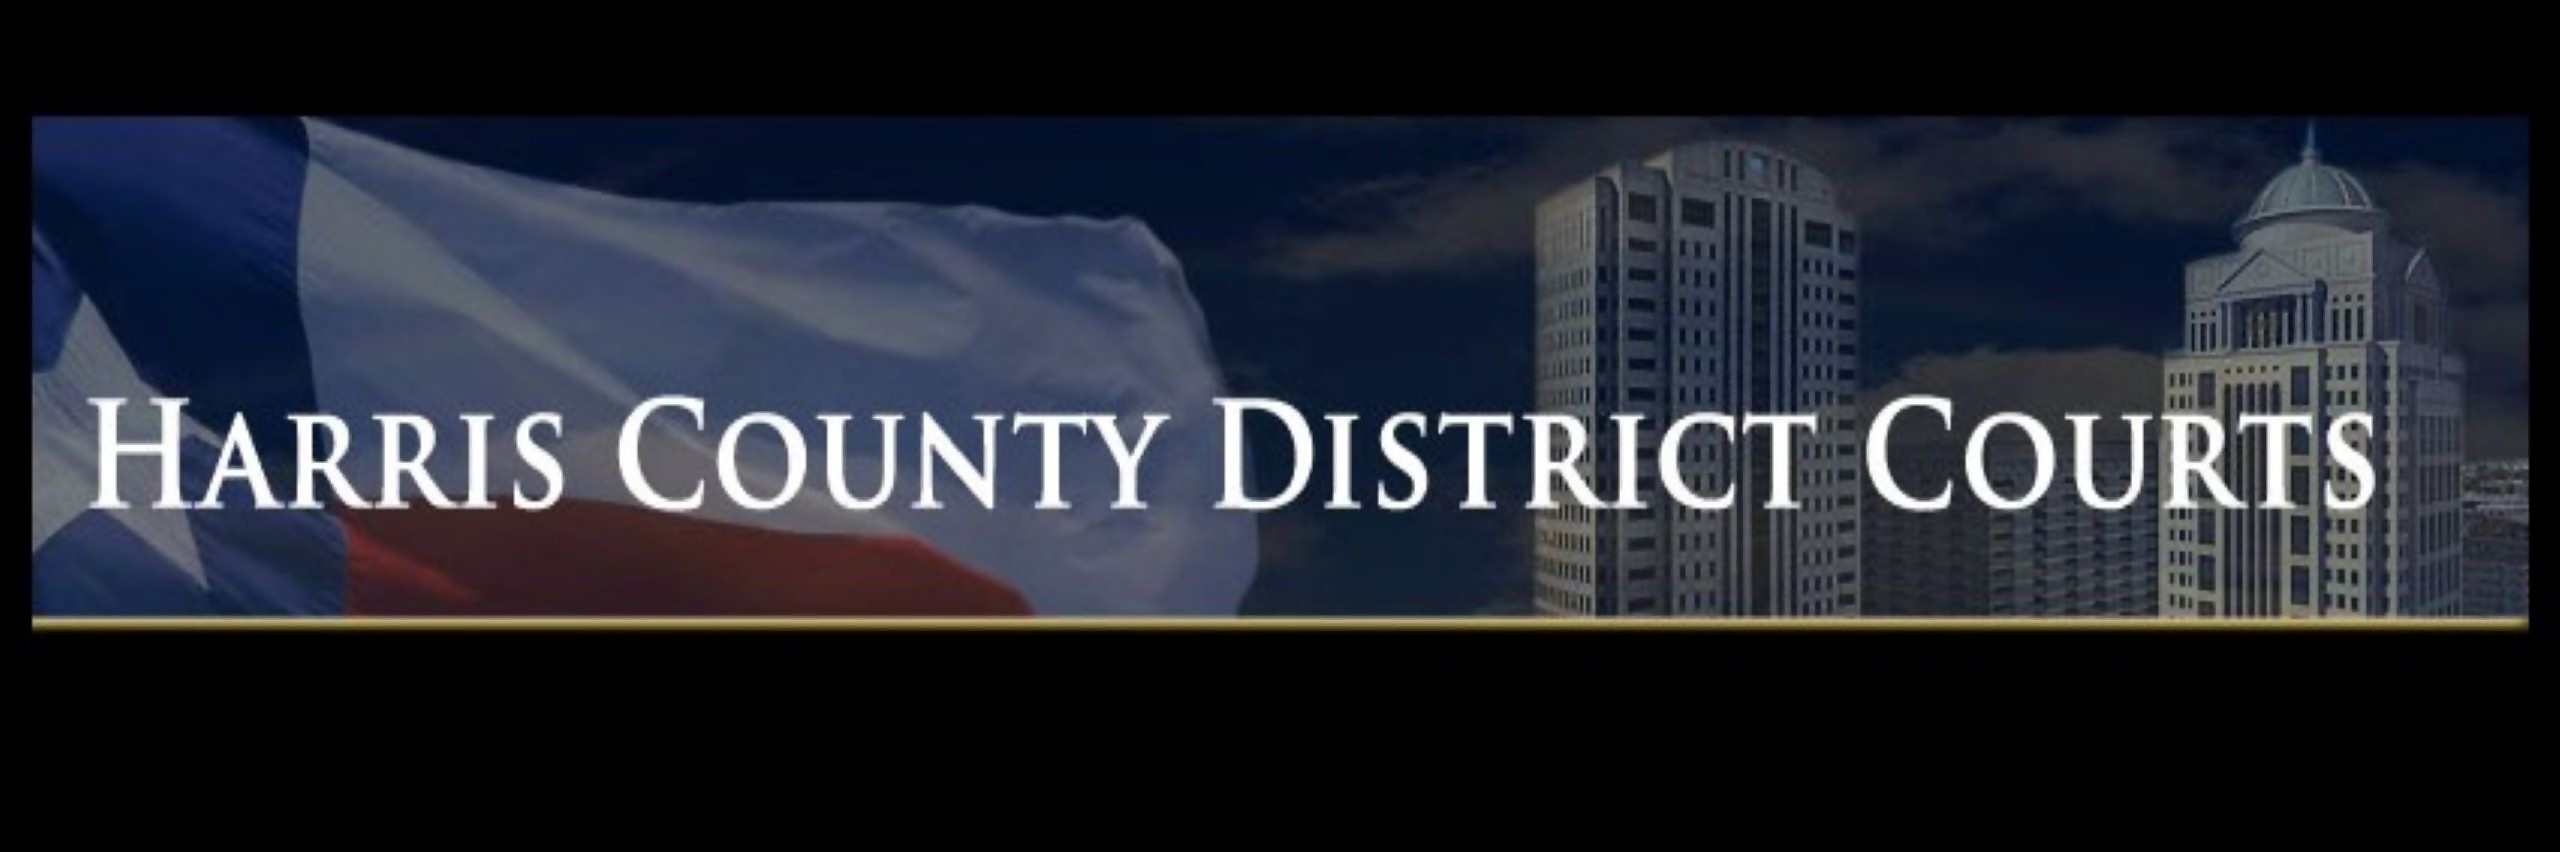 507th District Court AJ - Live Stream